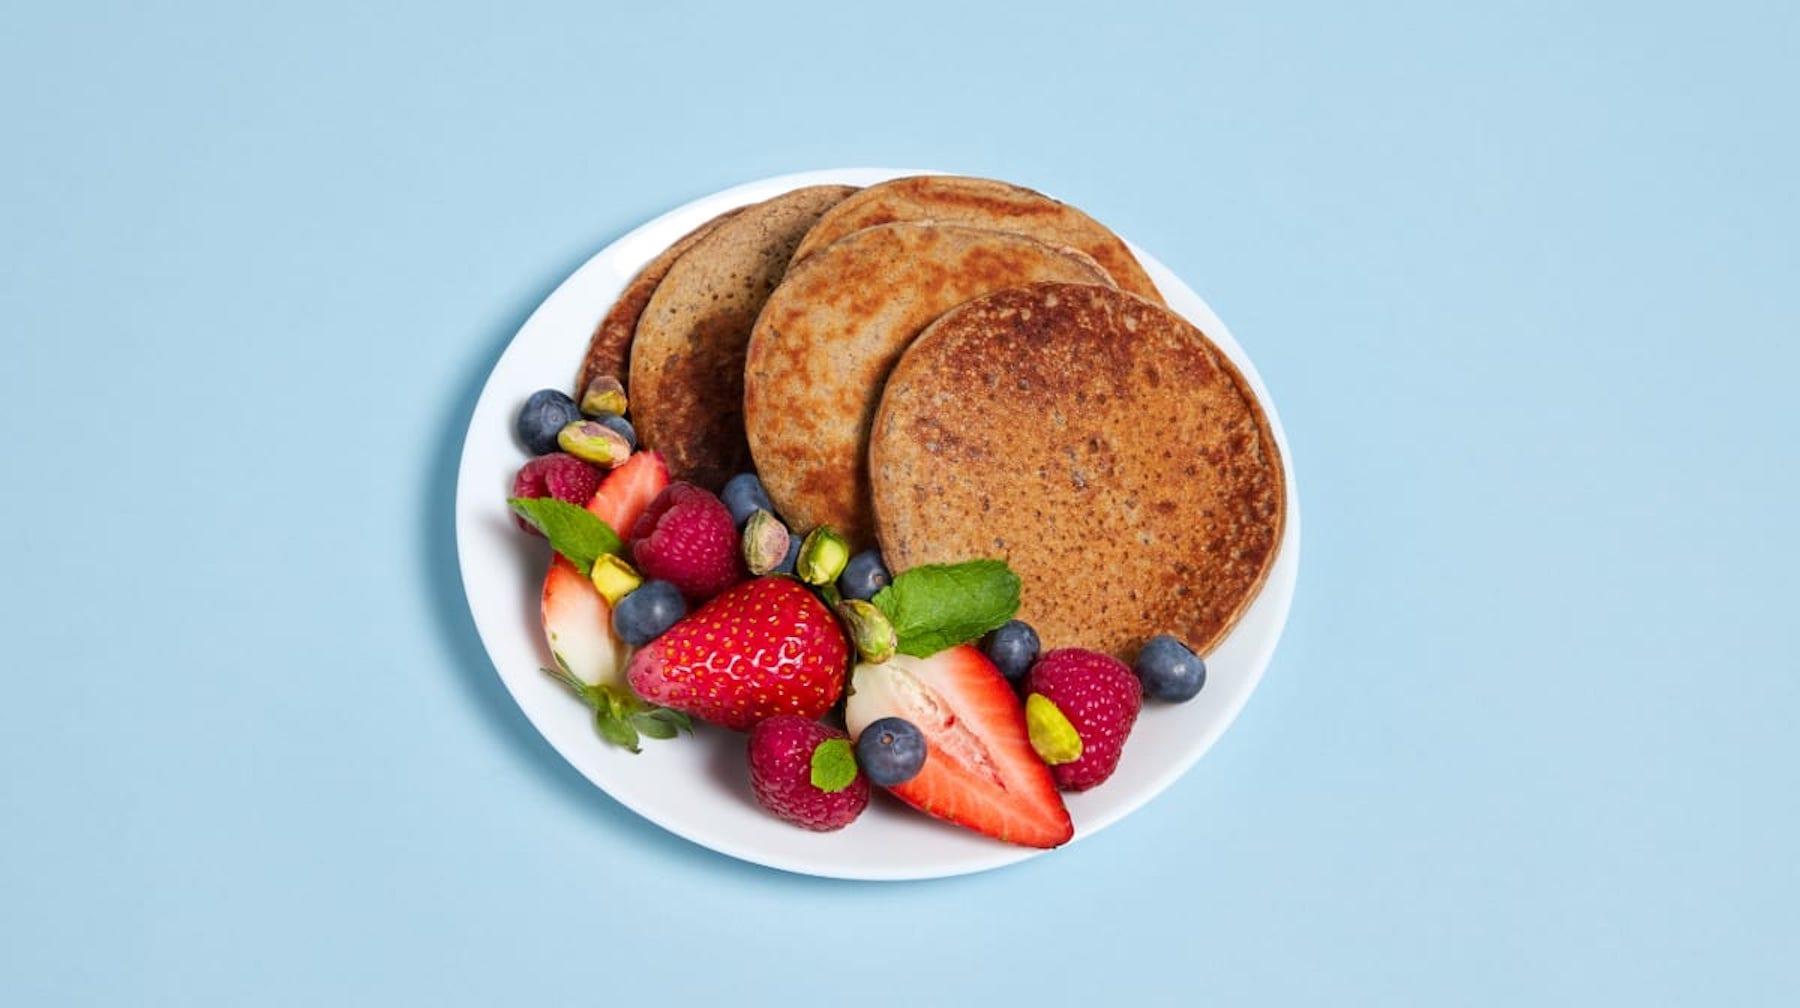 Sådan laver du de perfekte veganske pandekager